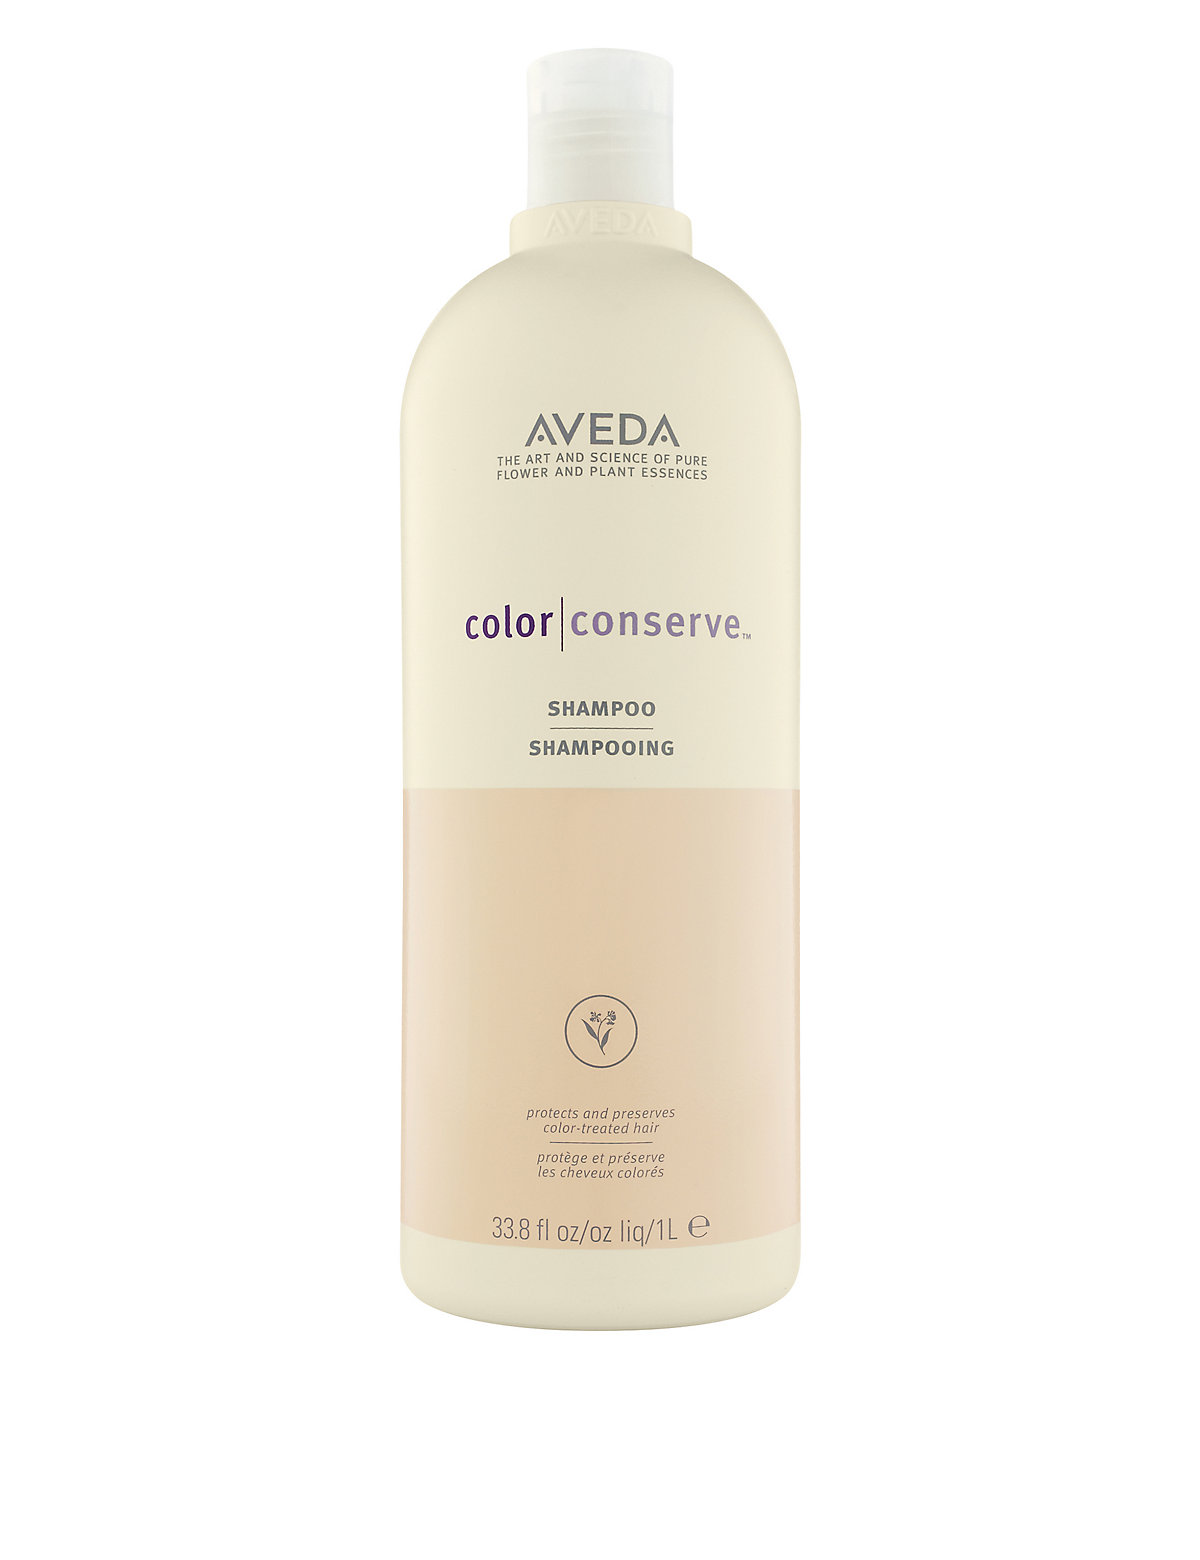 AVEDA 1 Litre Large Color Conserve Shampoo